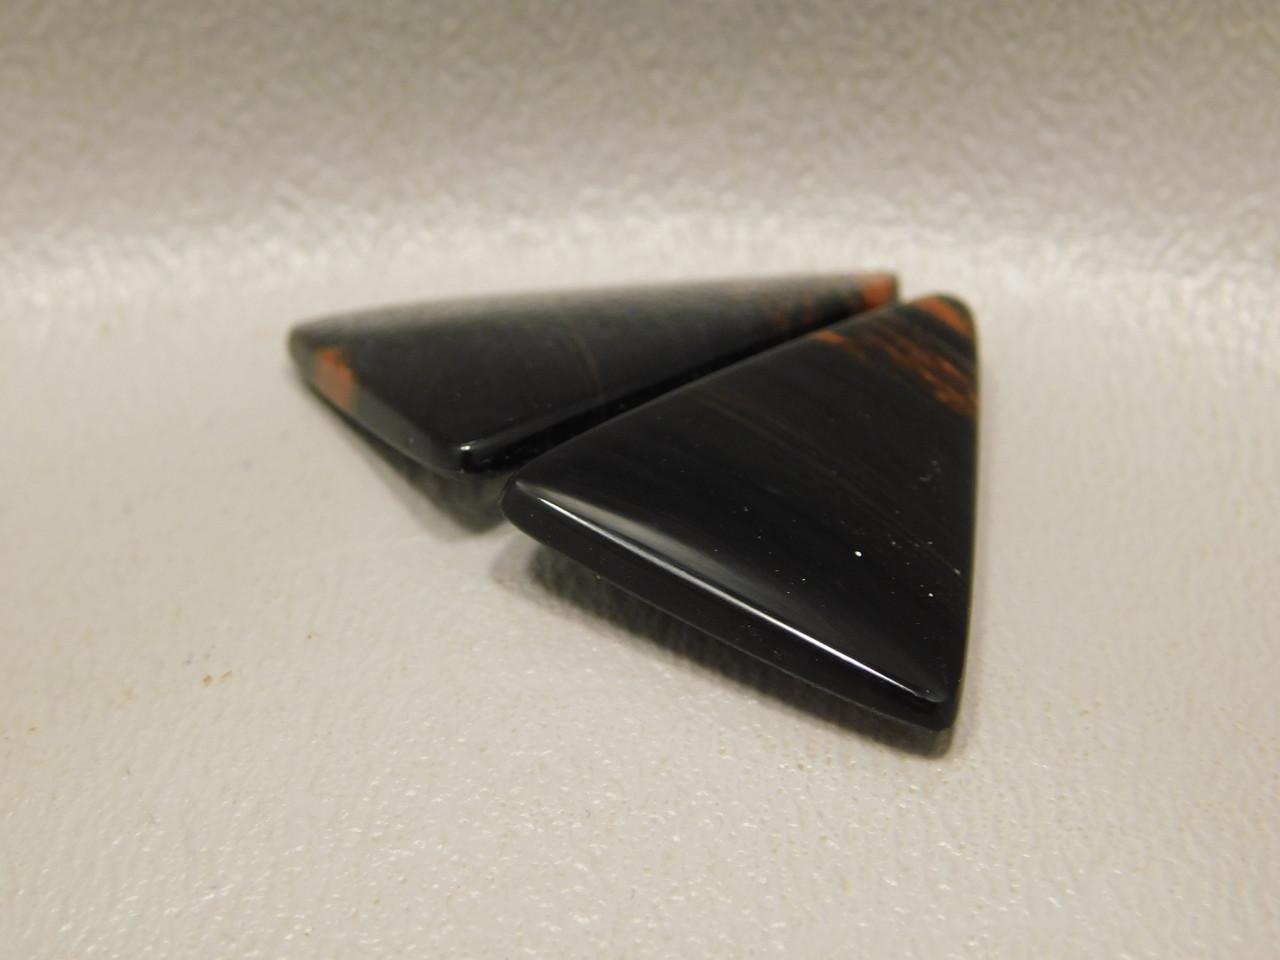 Matched Pairs Black Cabochons Mahogany Obsidian Jewelry Stones #19